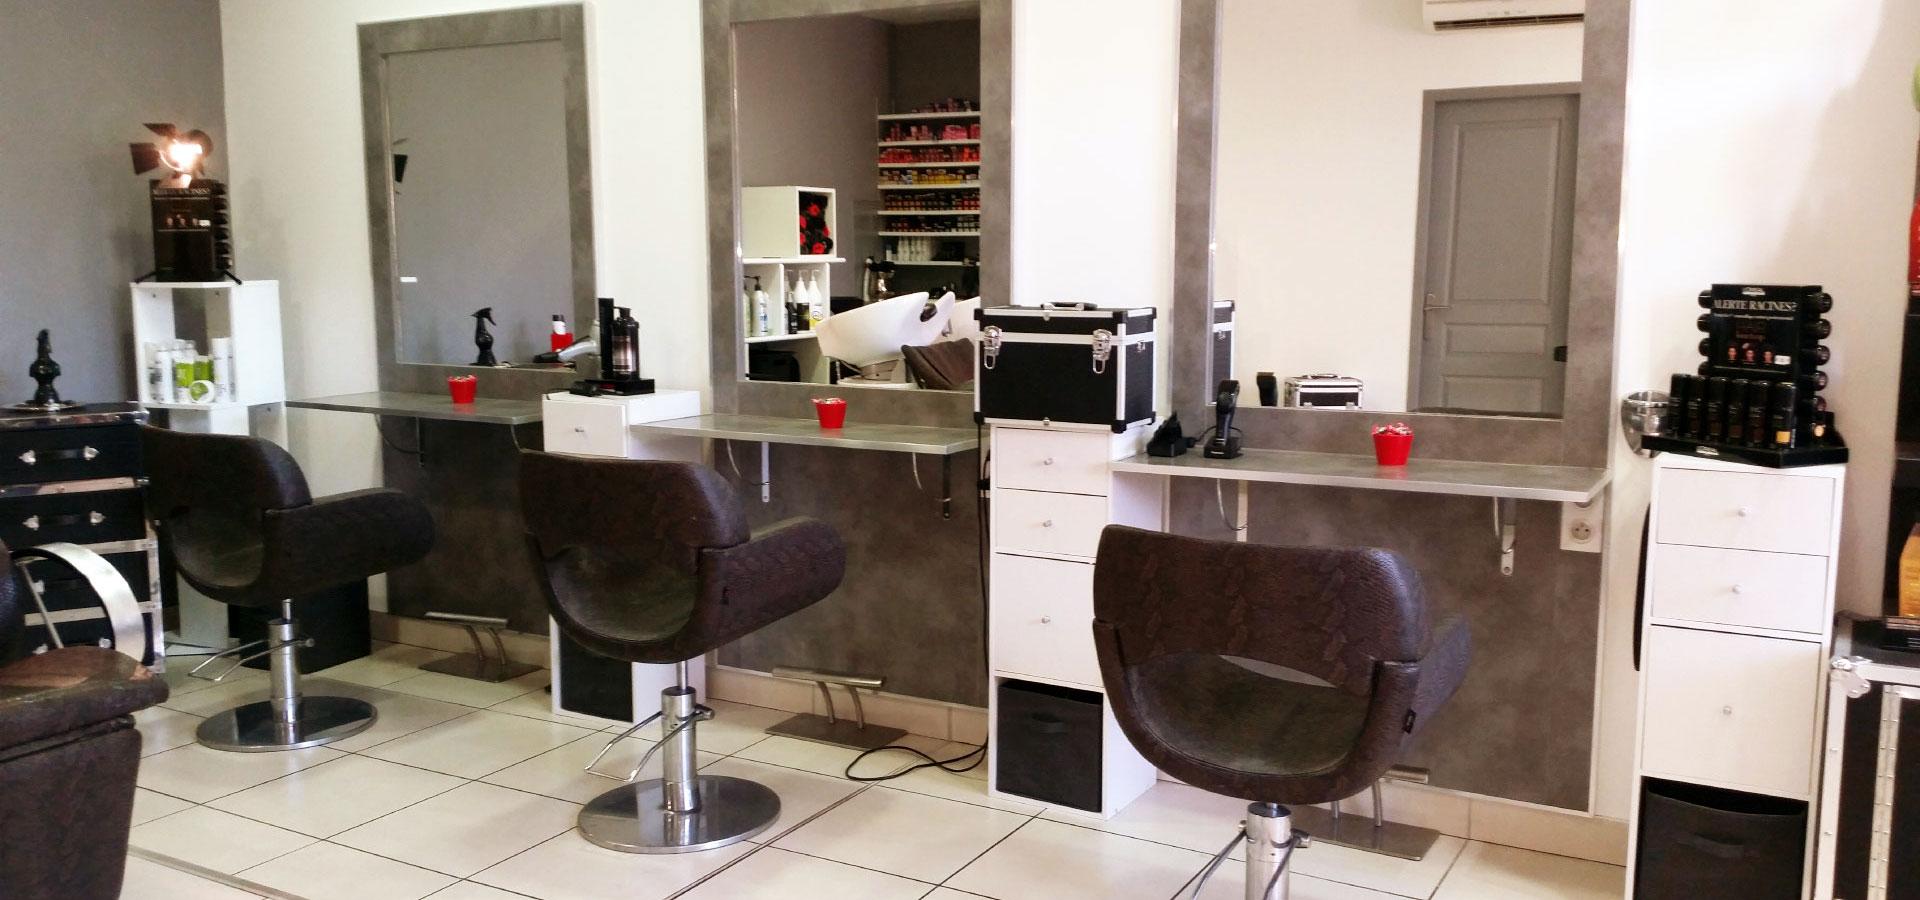 salon-coiffure-isle-sur-sorgue-84800-900-001